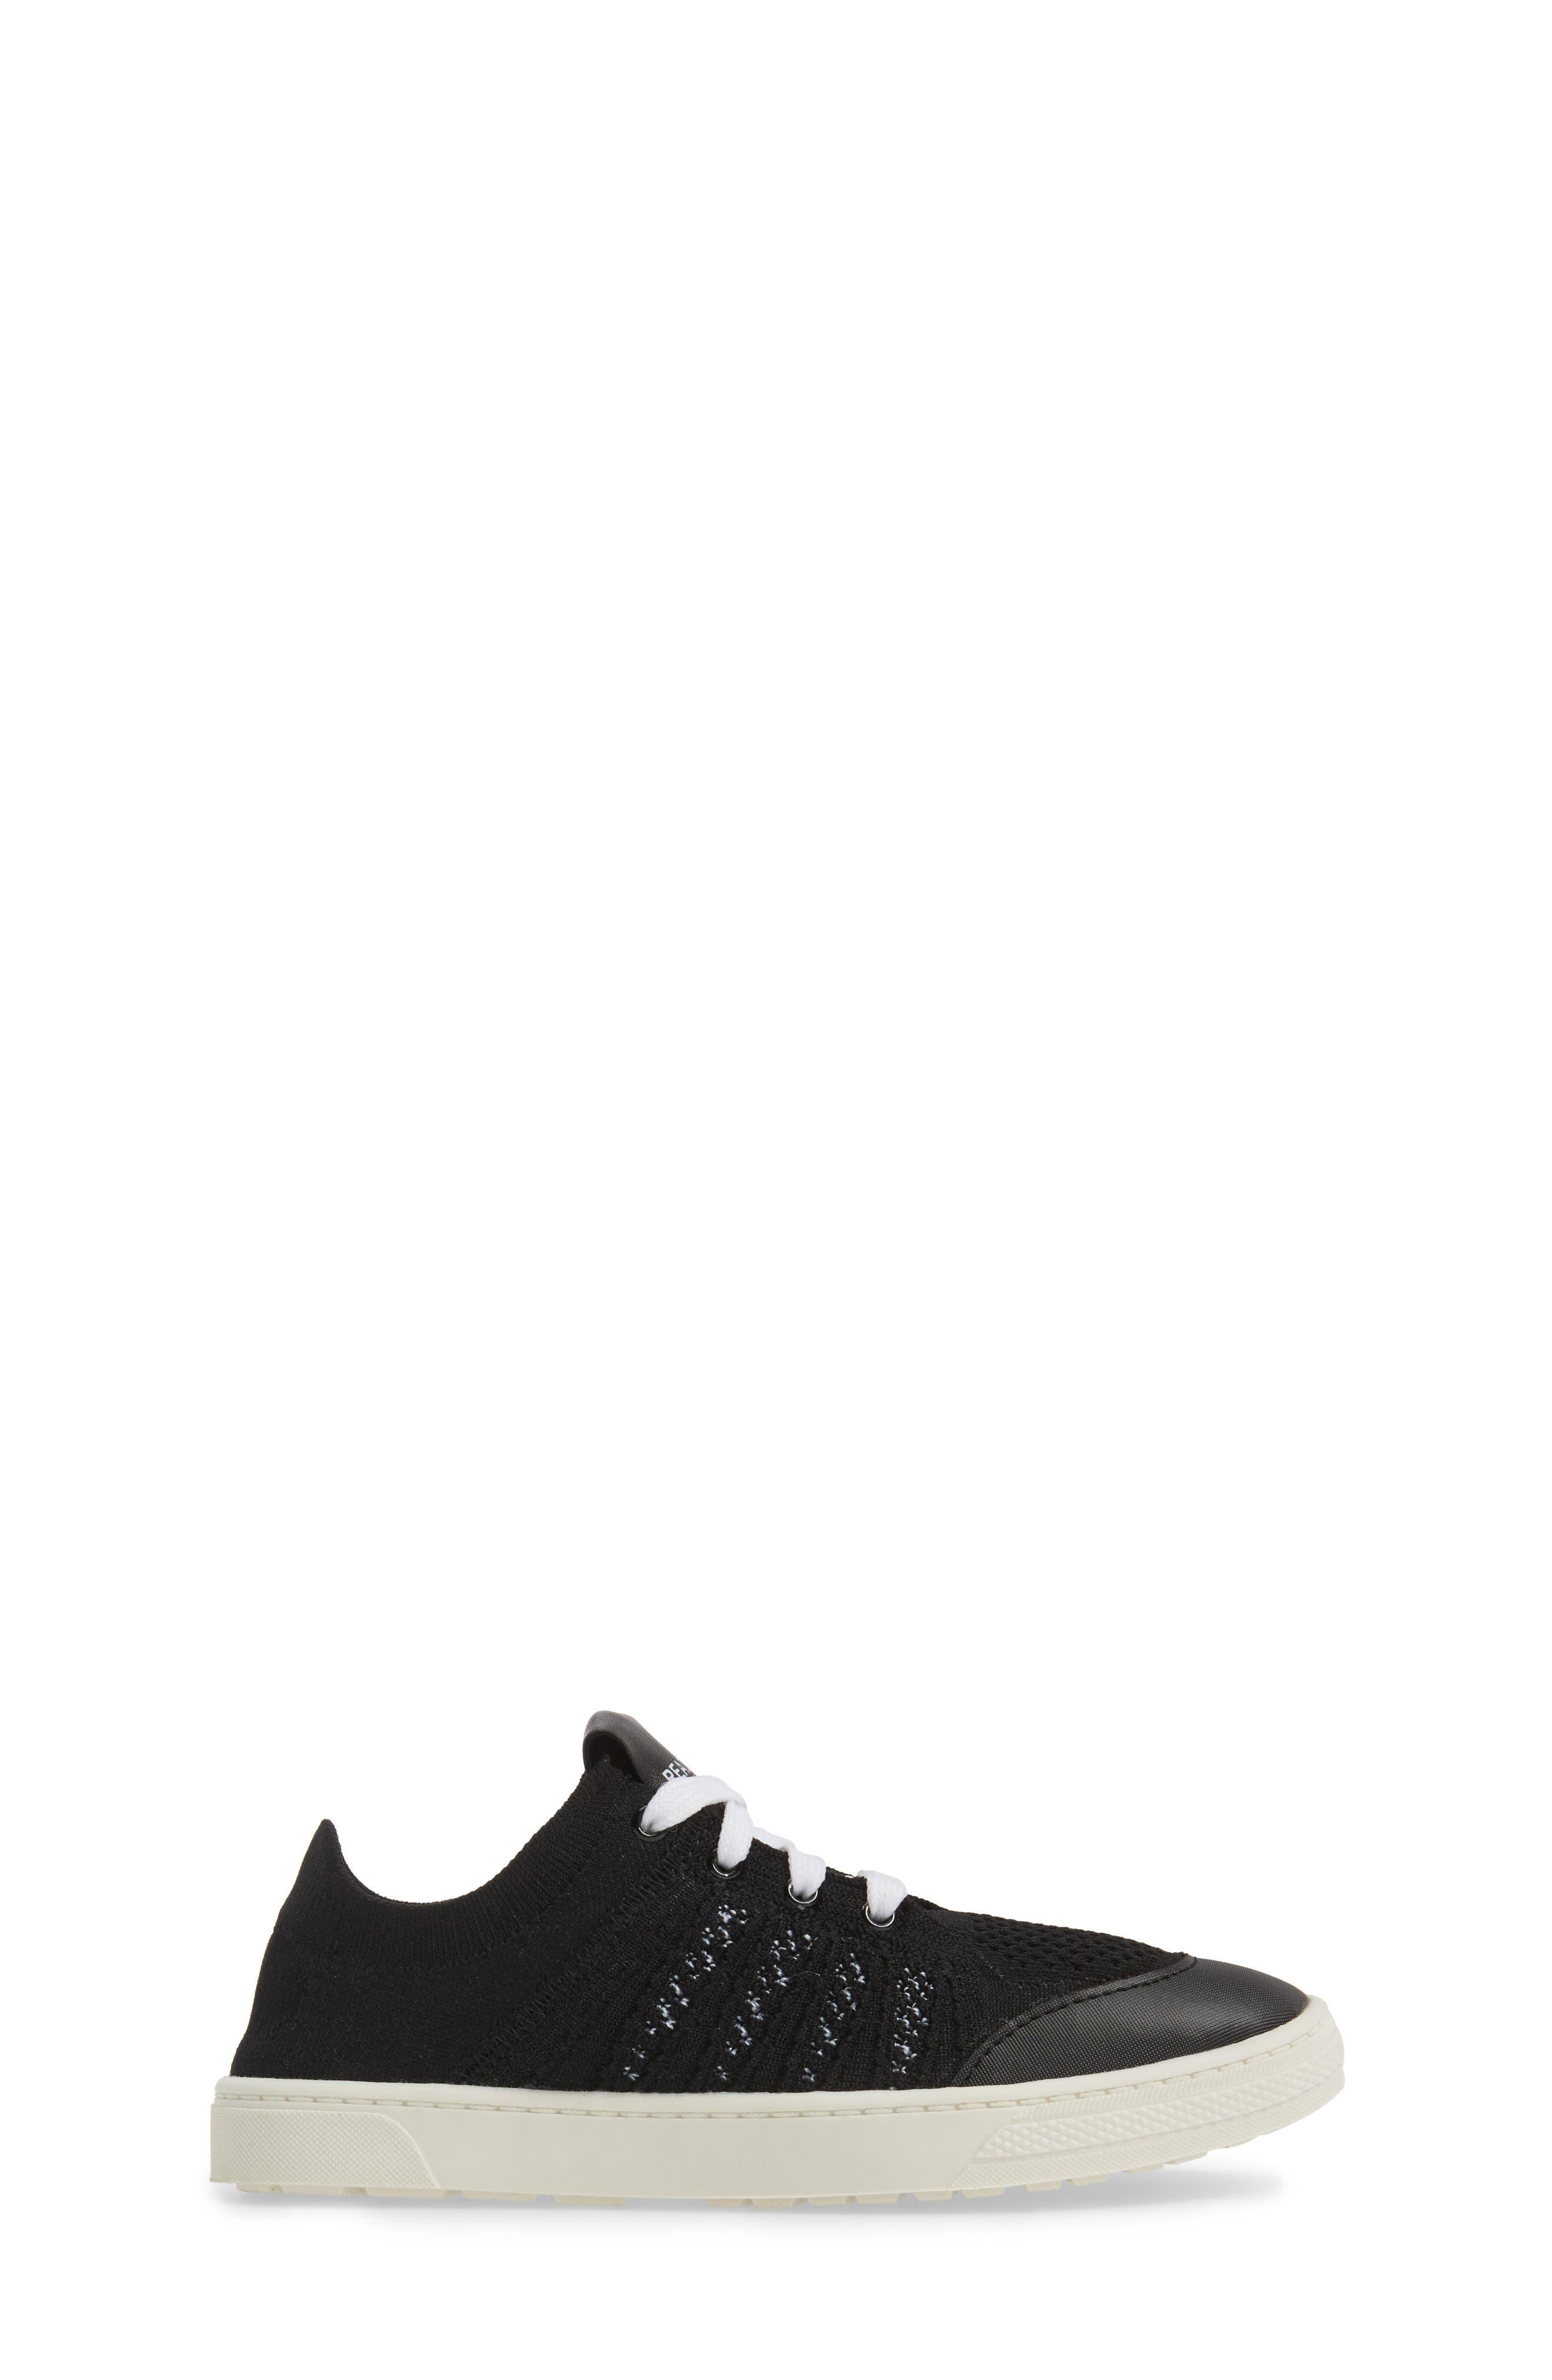 Kick Insight Woven Sneaker,                             Alternate thumbnail 3, color,                             001